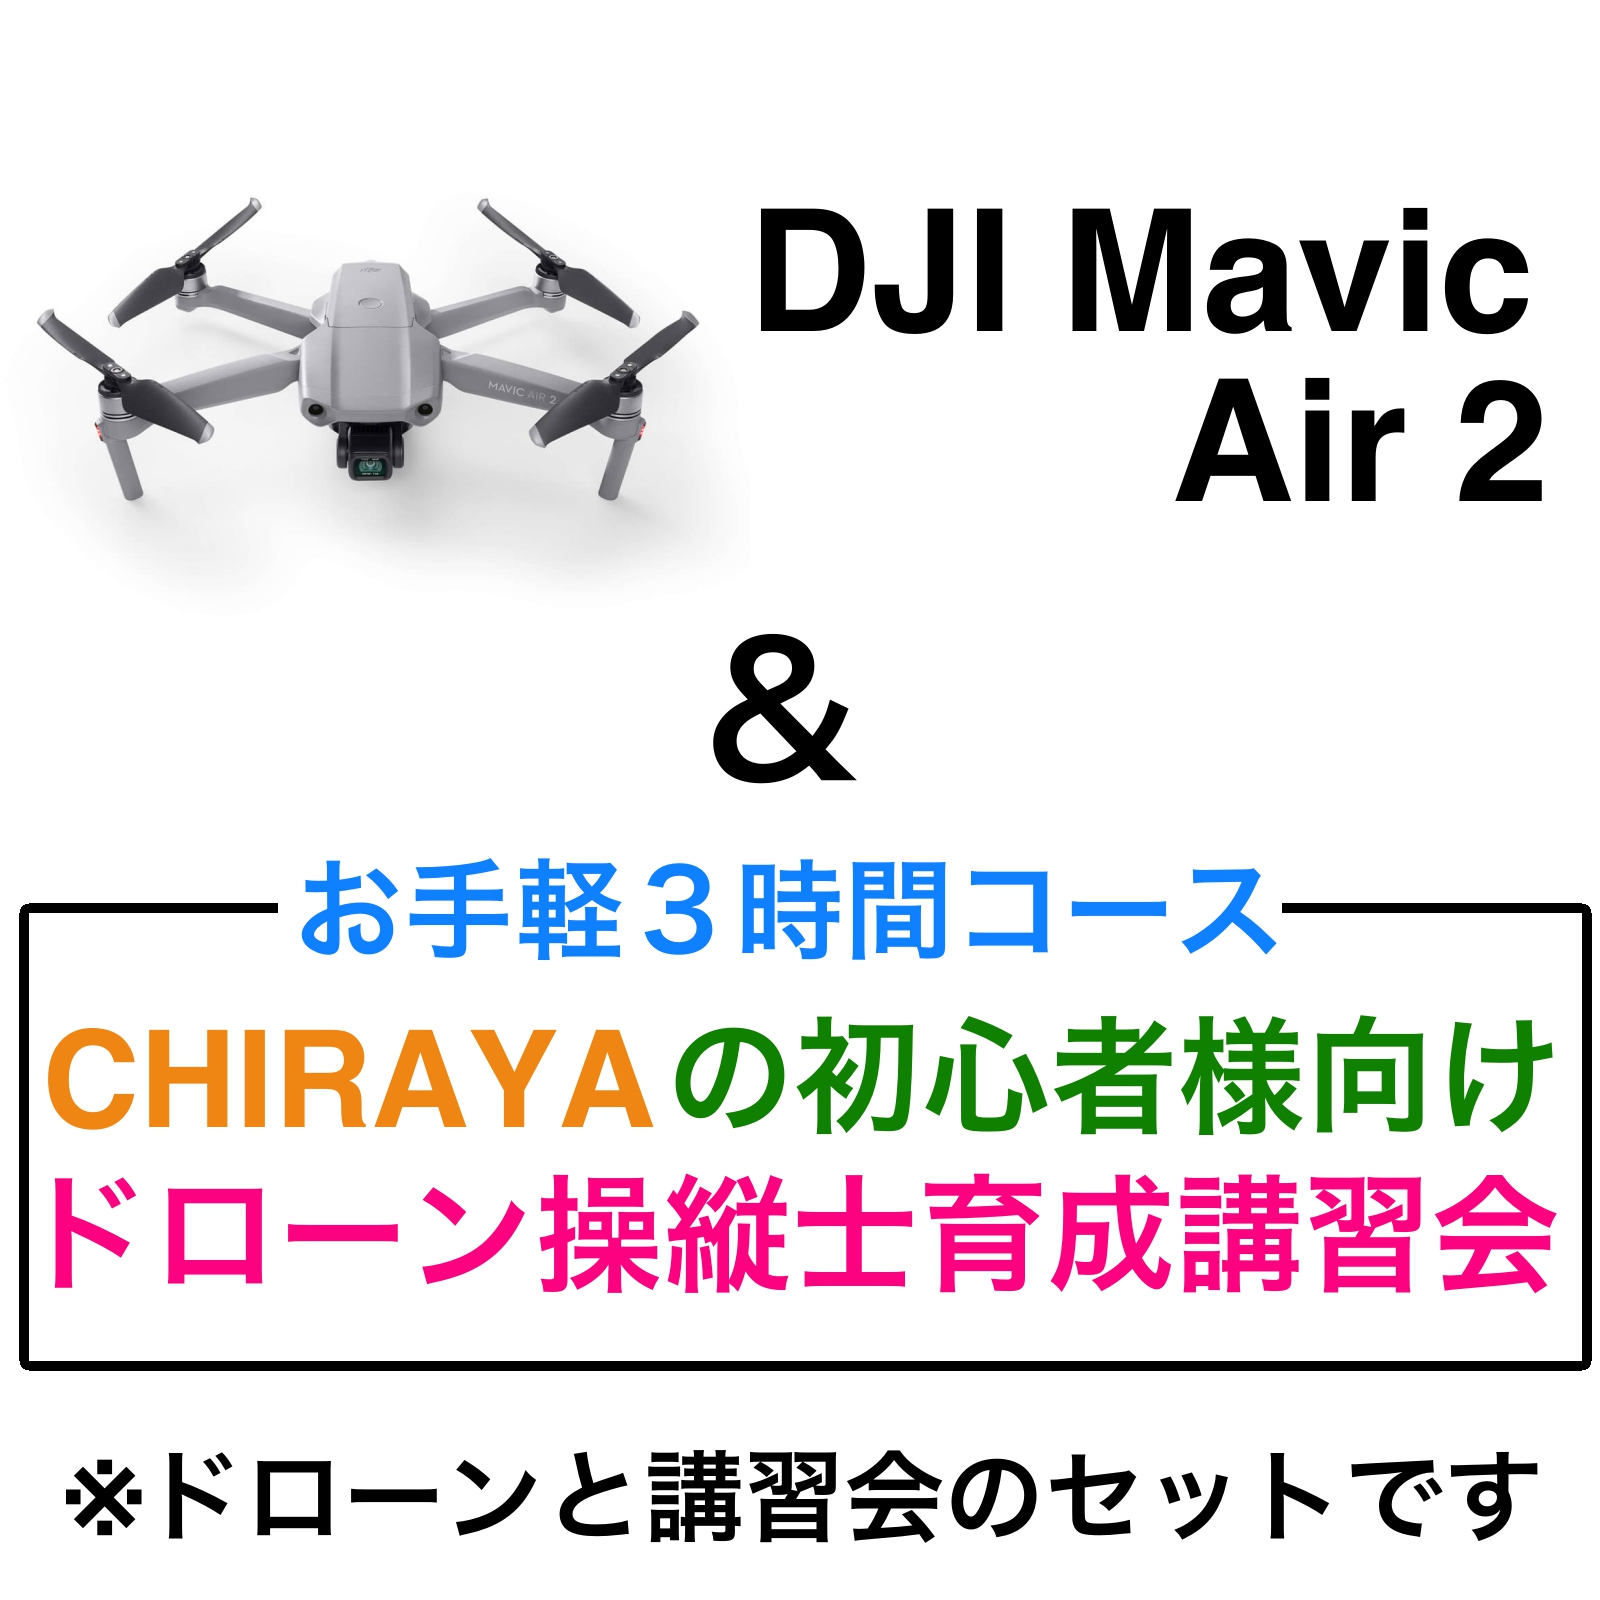 DJI Mavic Air 2 Fly More コンボ&【個別レッスン 3時間コース】CHRAYAの初心者様向けドローン操縦士育成講習会セット